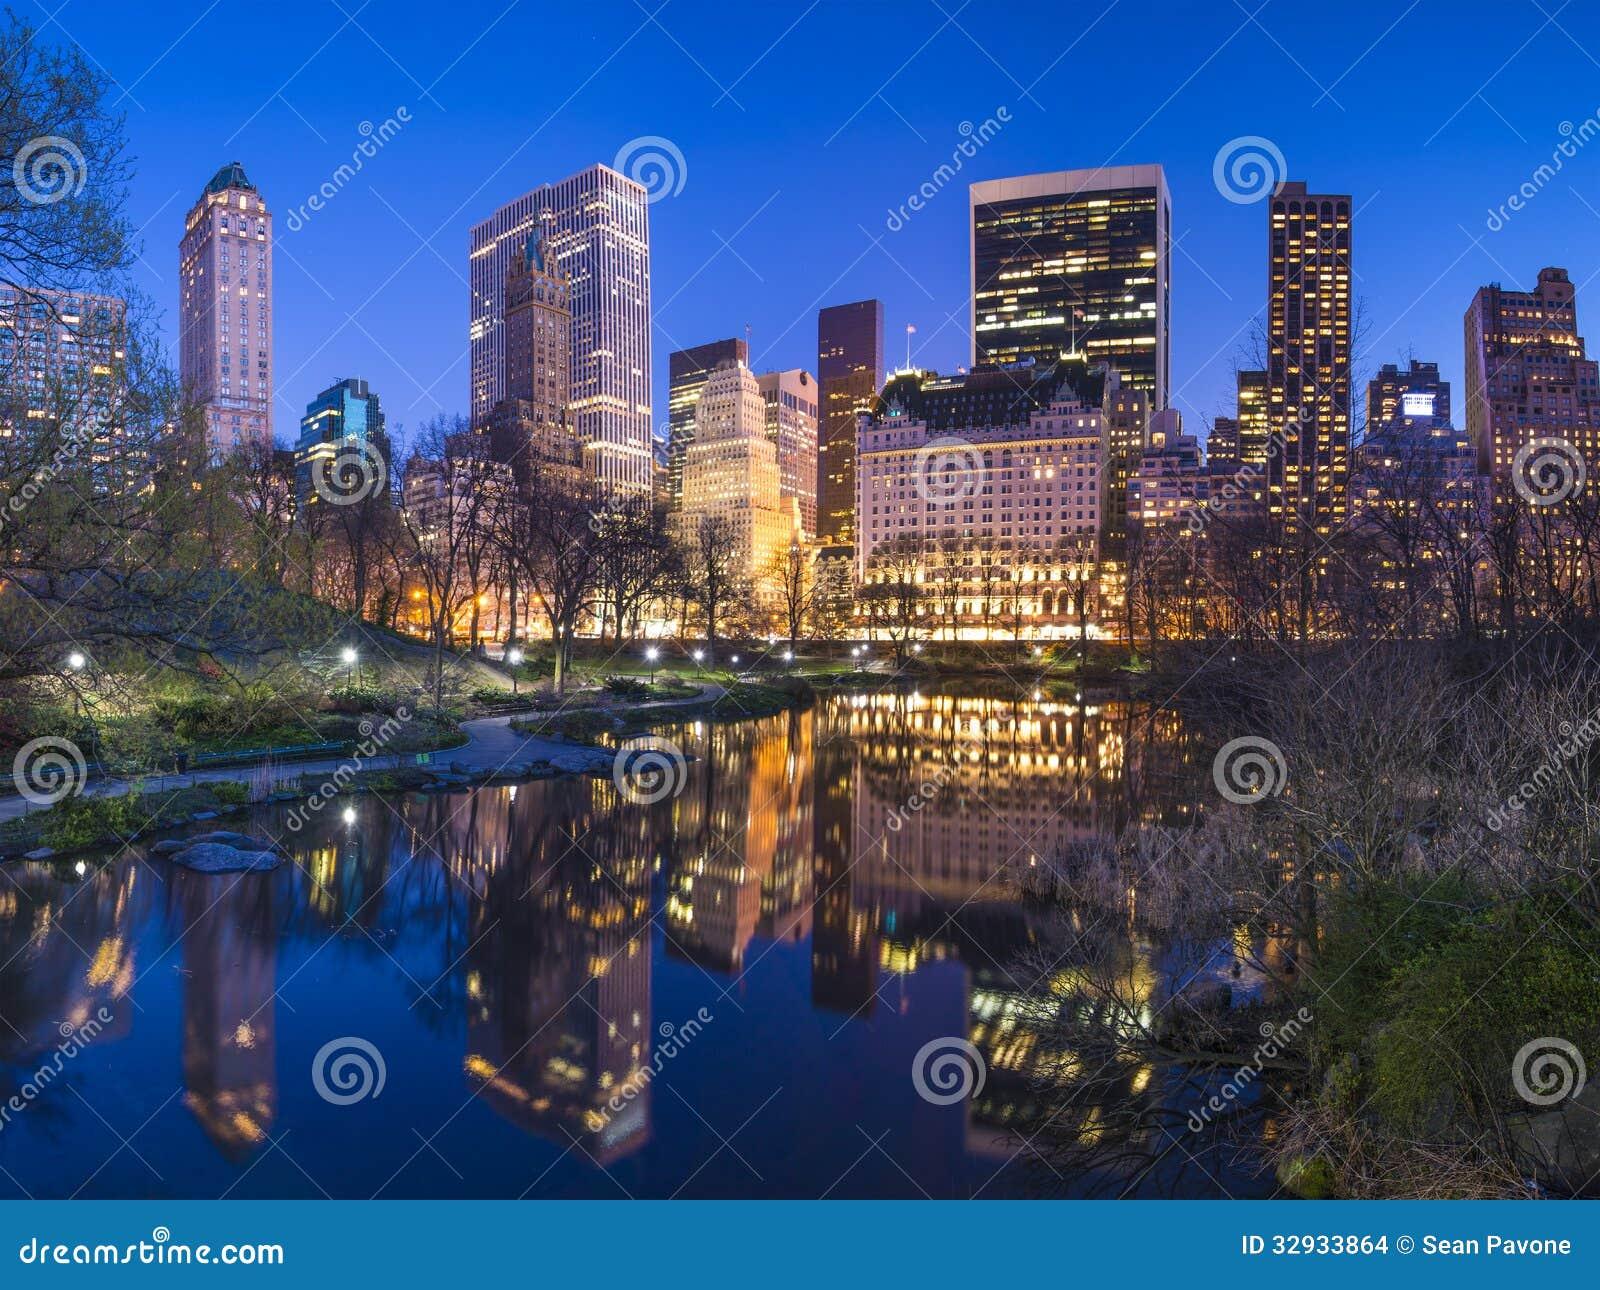 New York City Central Park South Skyline